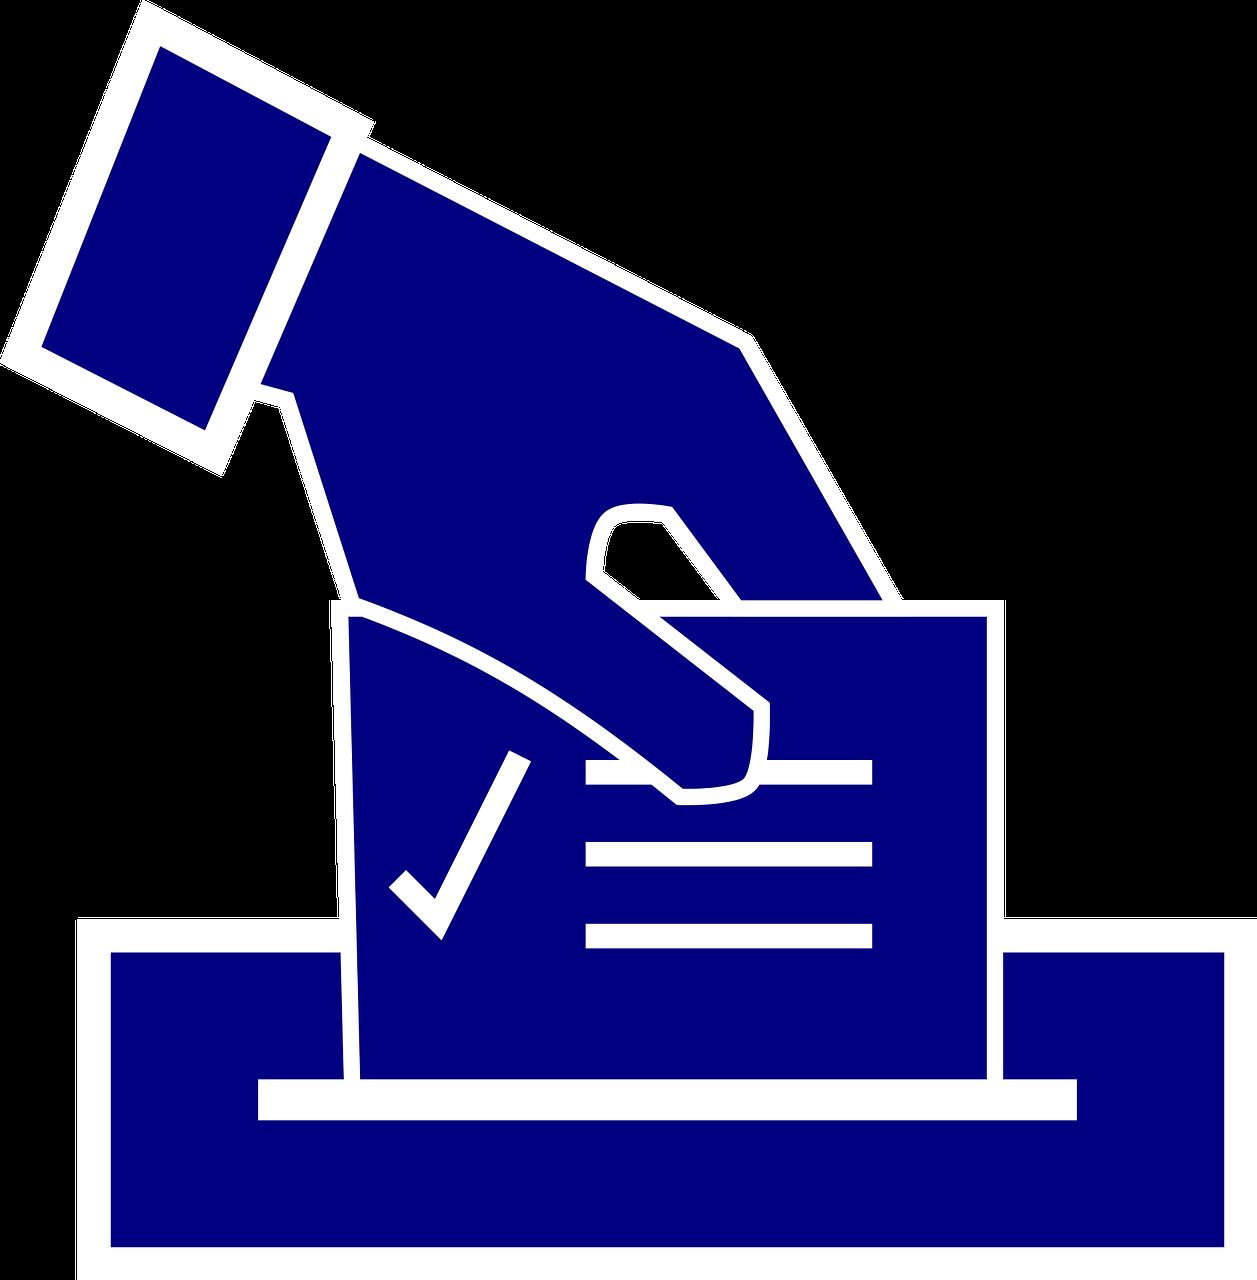 Voting clipart voter registration, Voting voter registration.